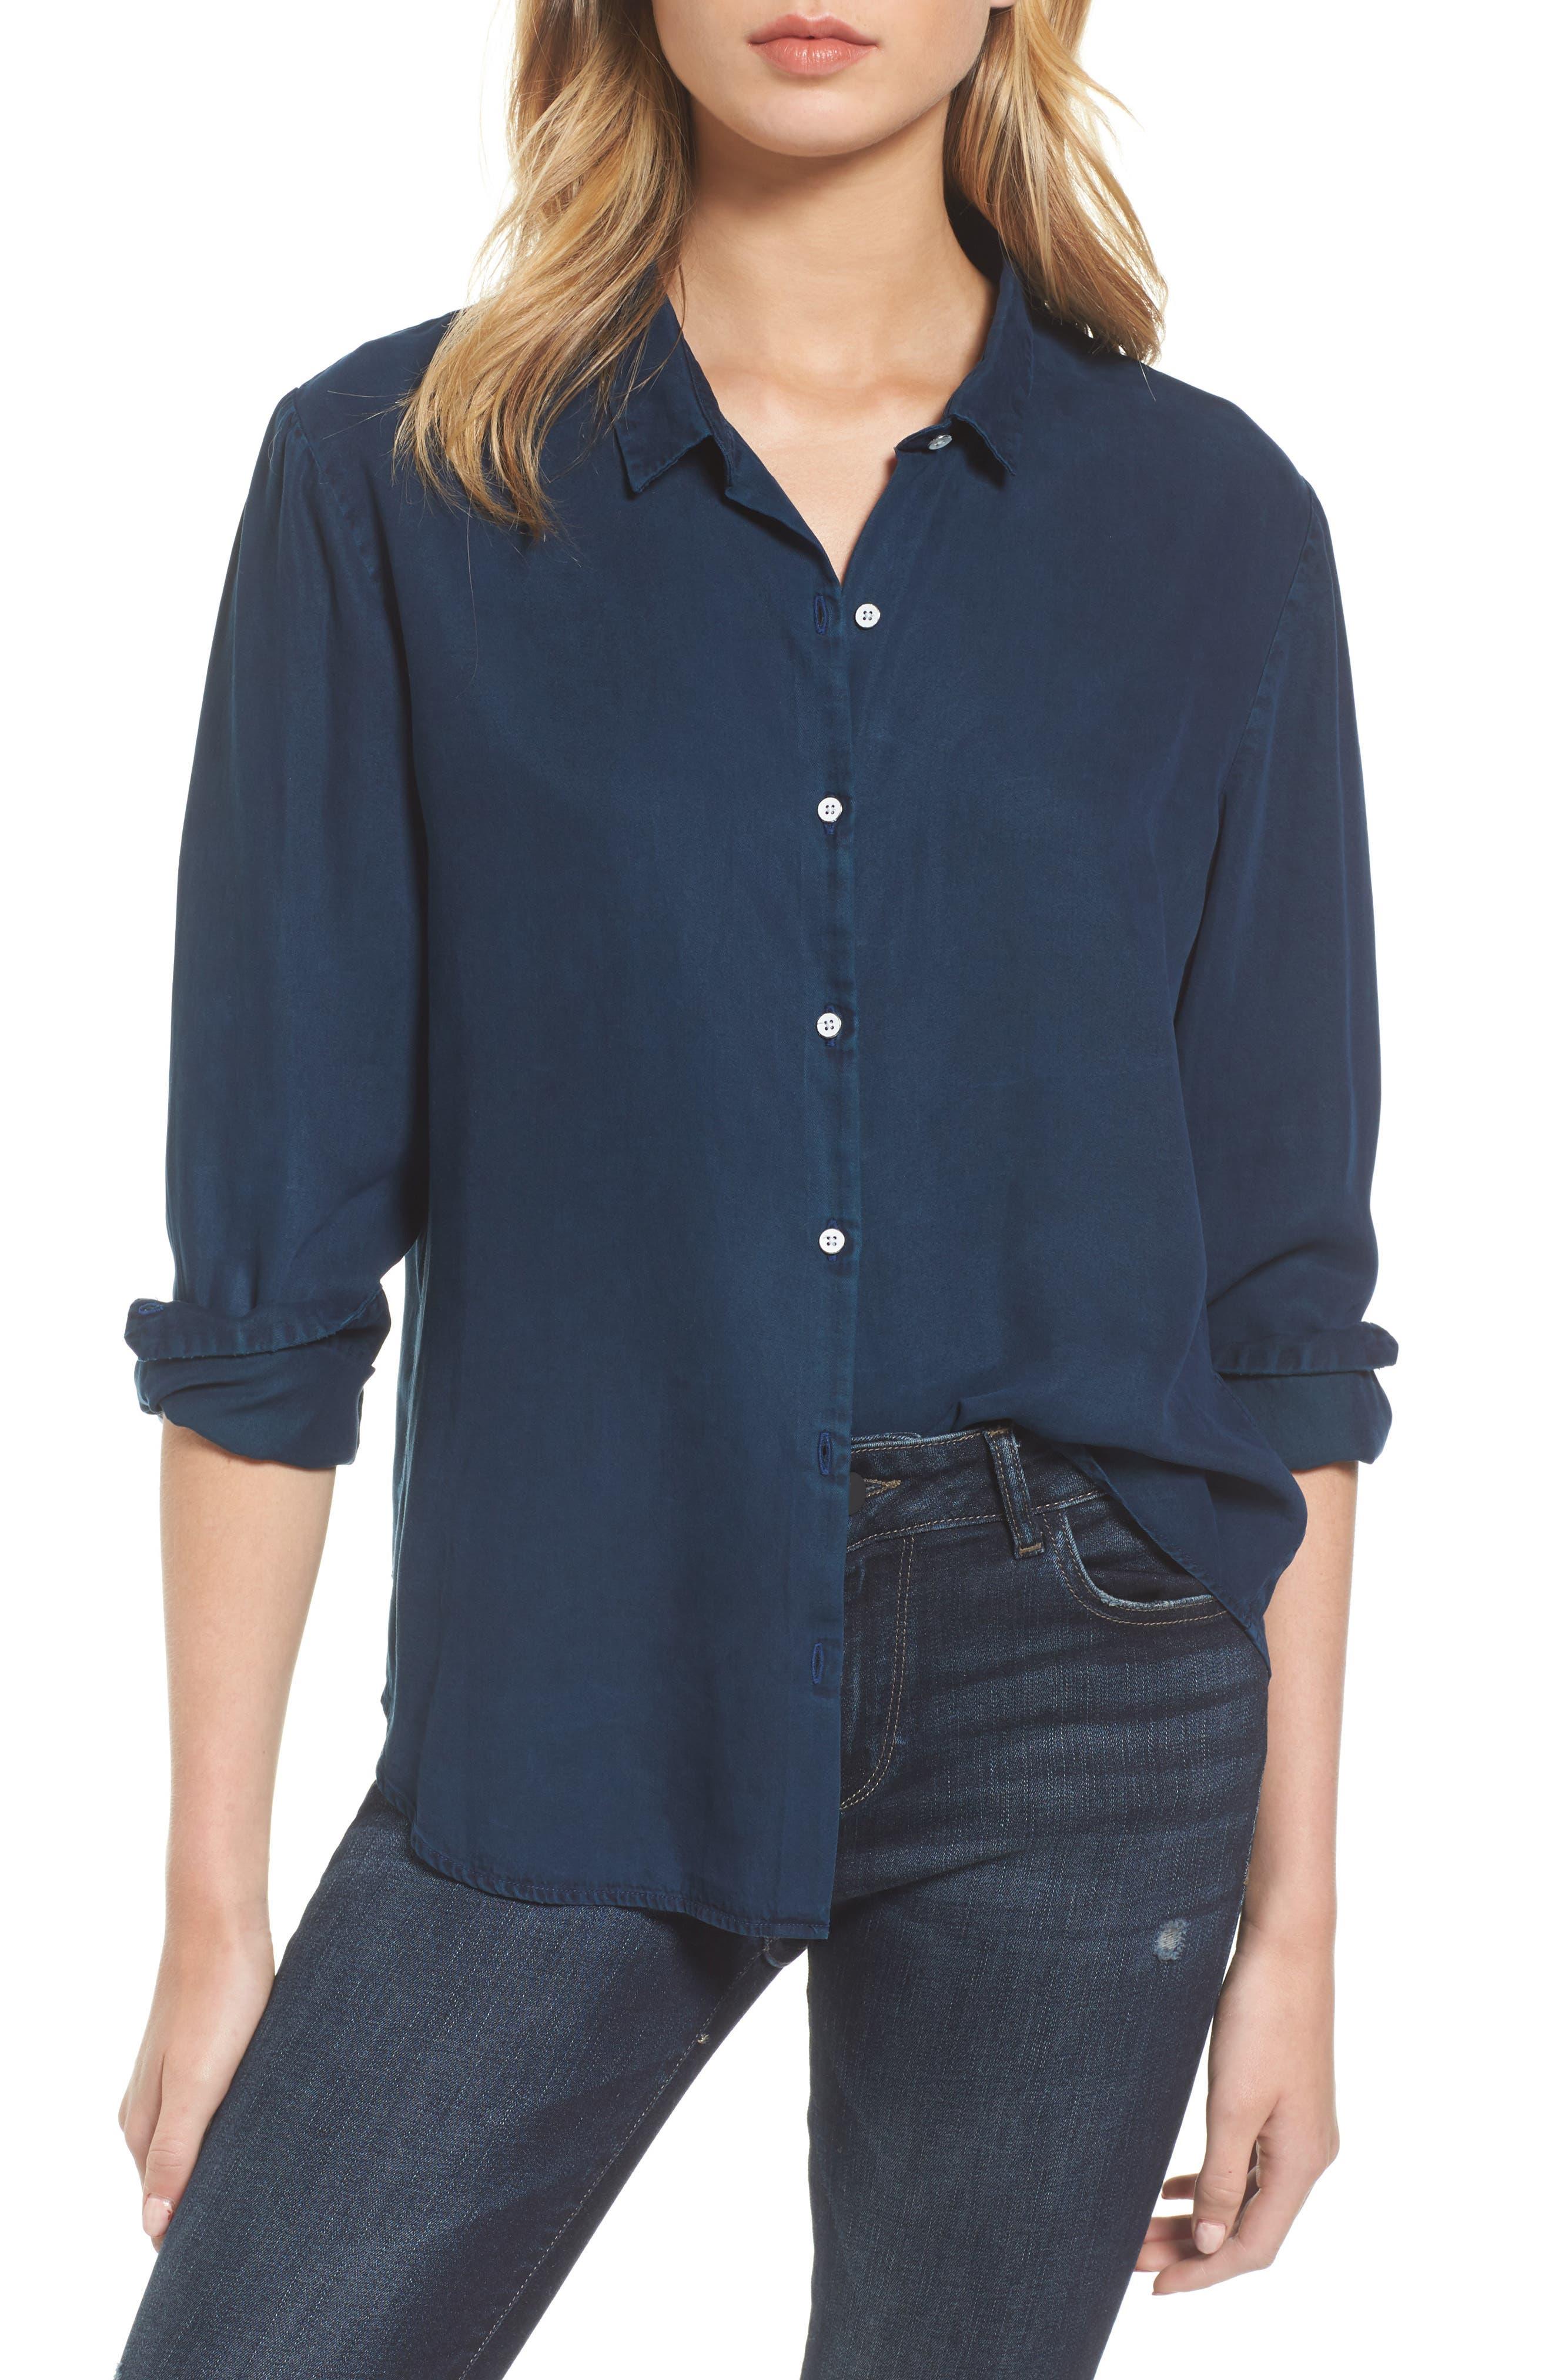 x The Blue Shirt Shop W 4th & Jane Slim Fit Shirt,                         Main,                         color, 405